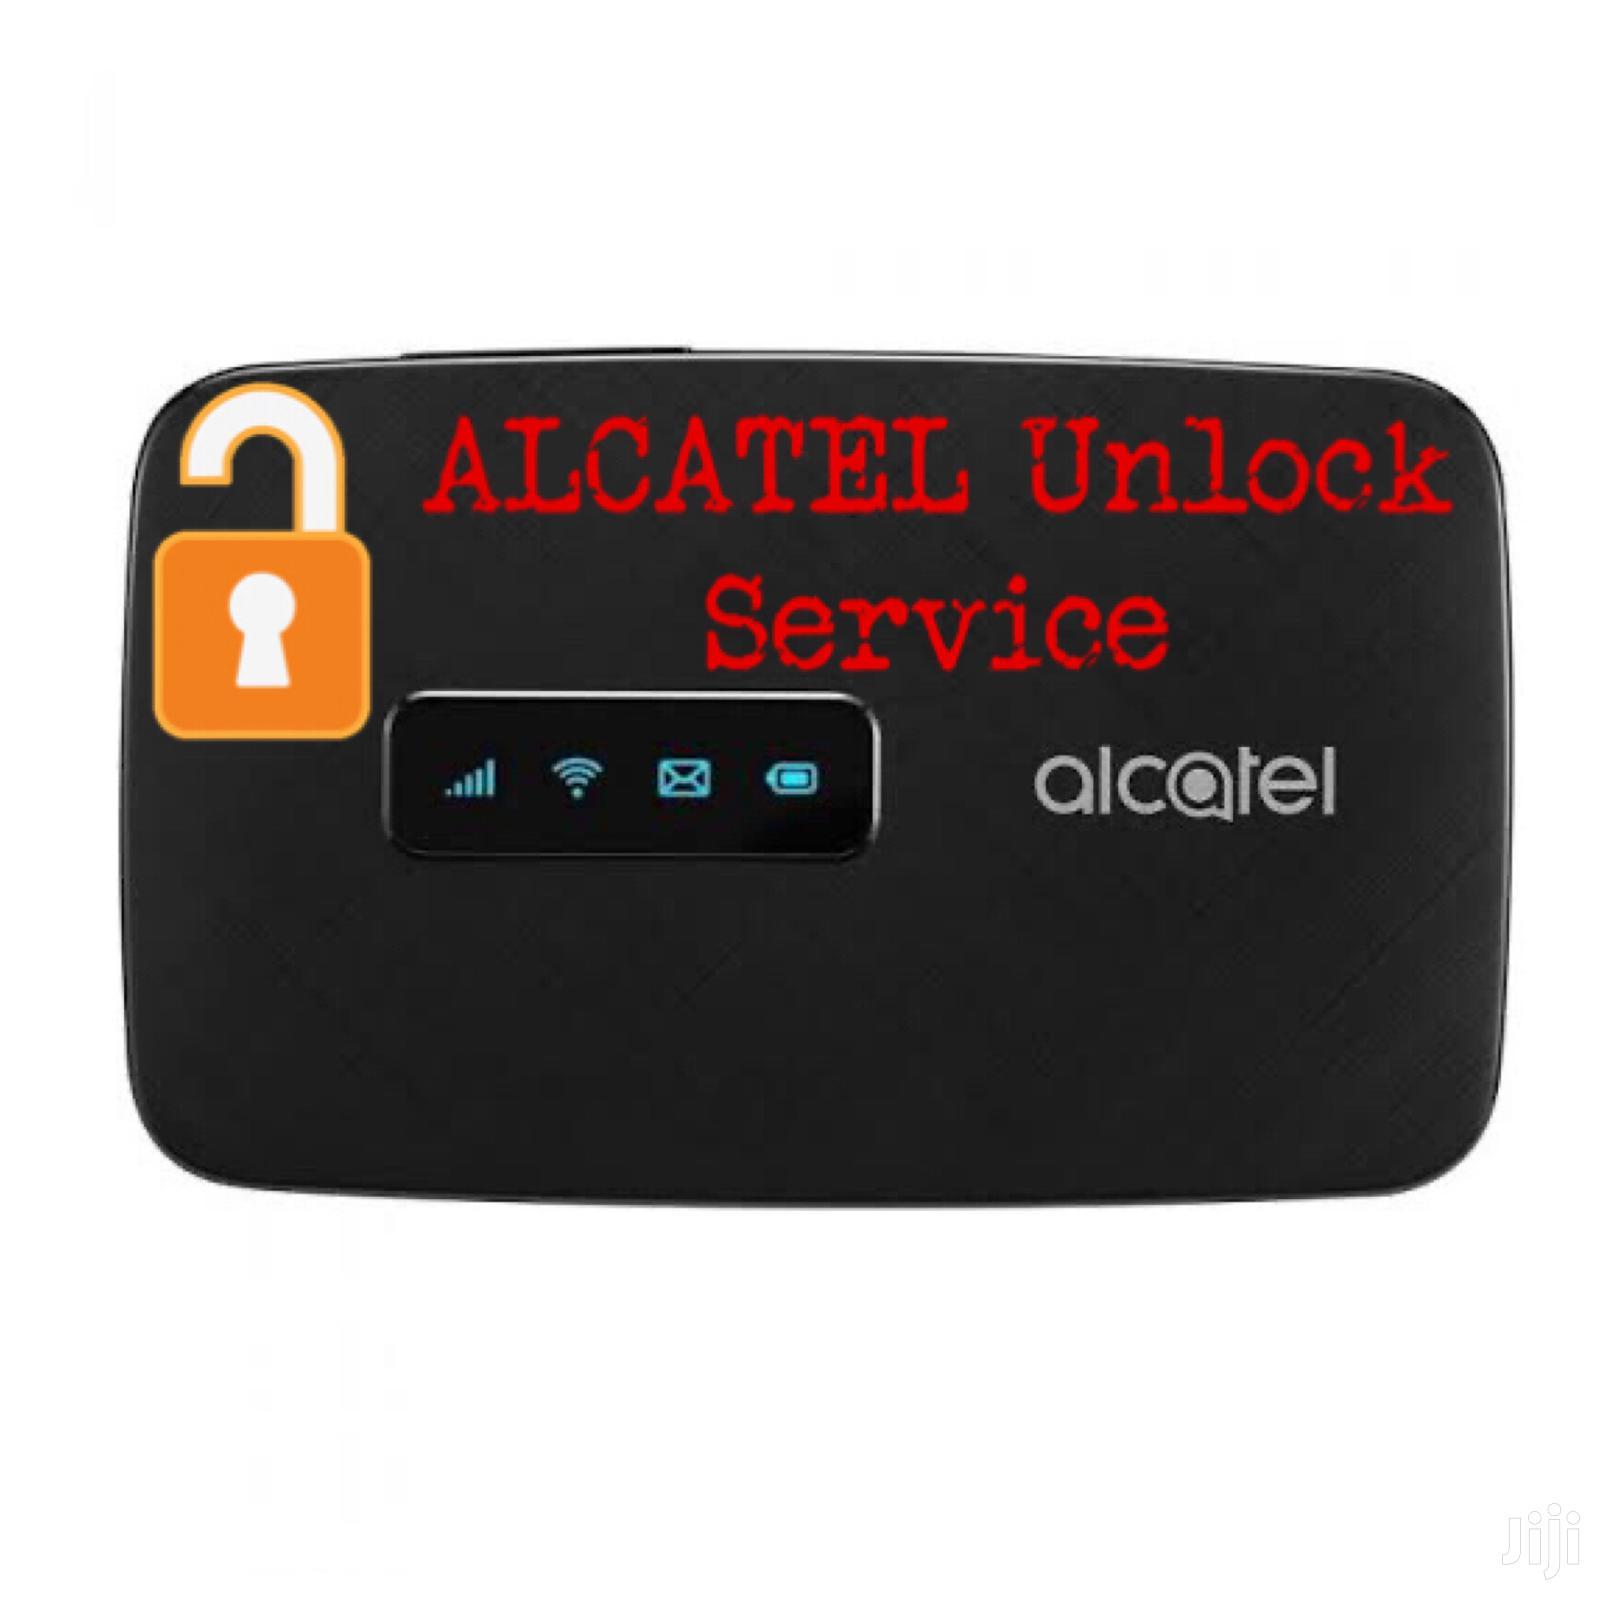 Unlock Alcatel Mifi Linkzone TCL Unlocking Service